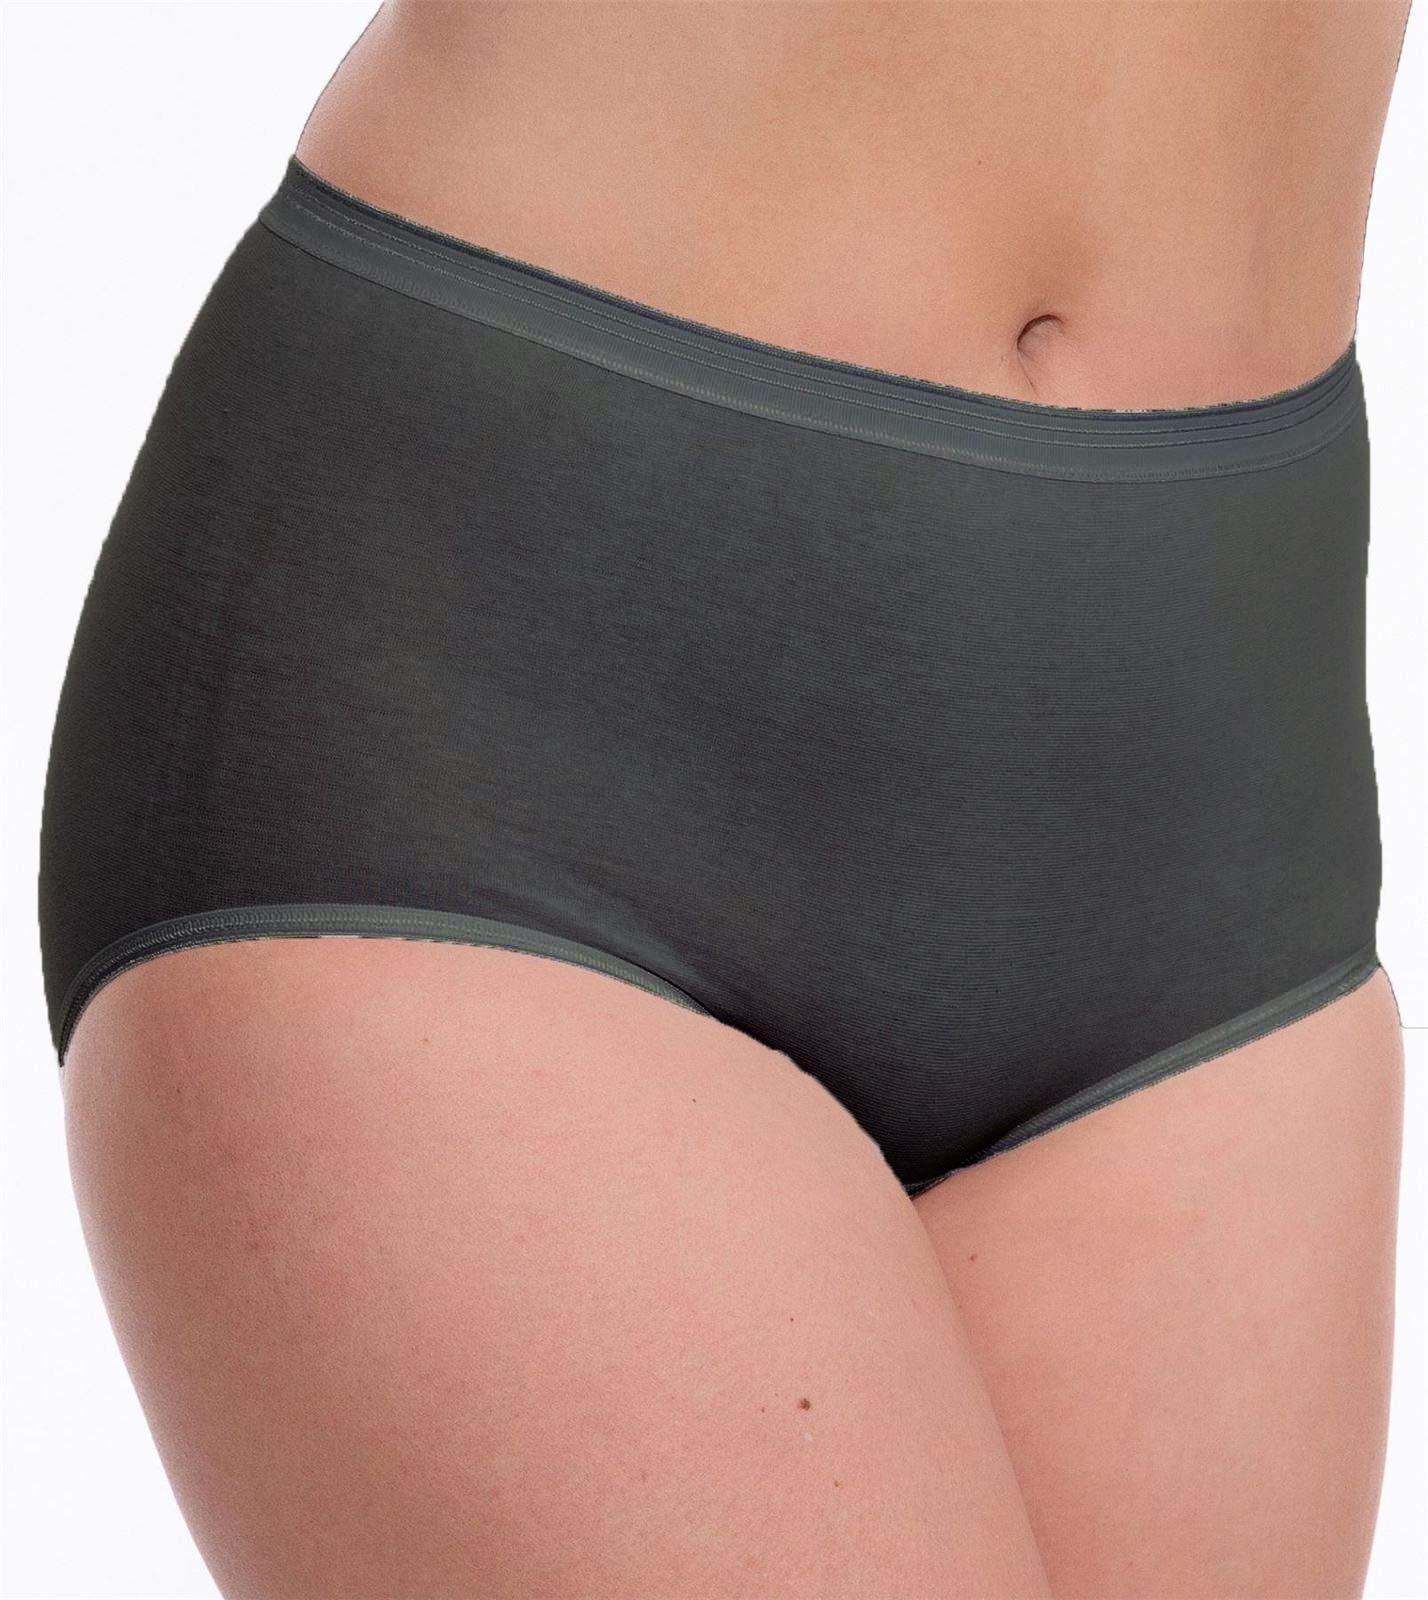 Marlon Smooth Maxi 95/% Cotton Full Briefs Nude Various Sizes